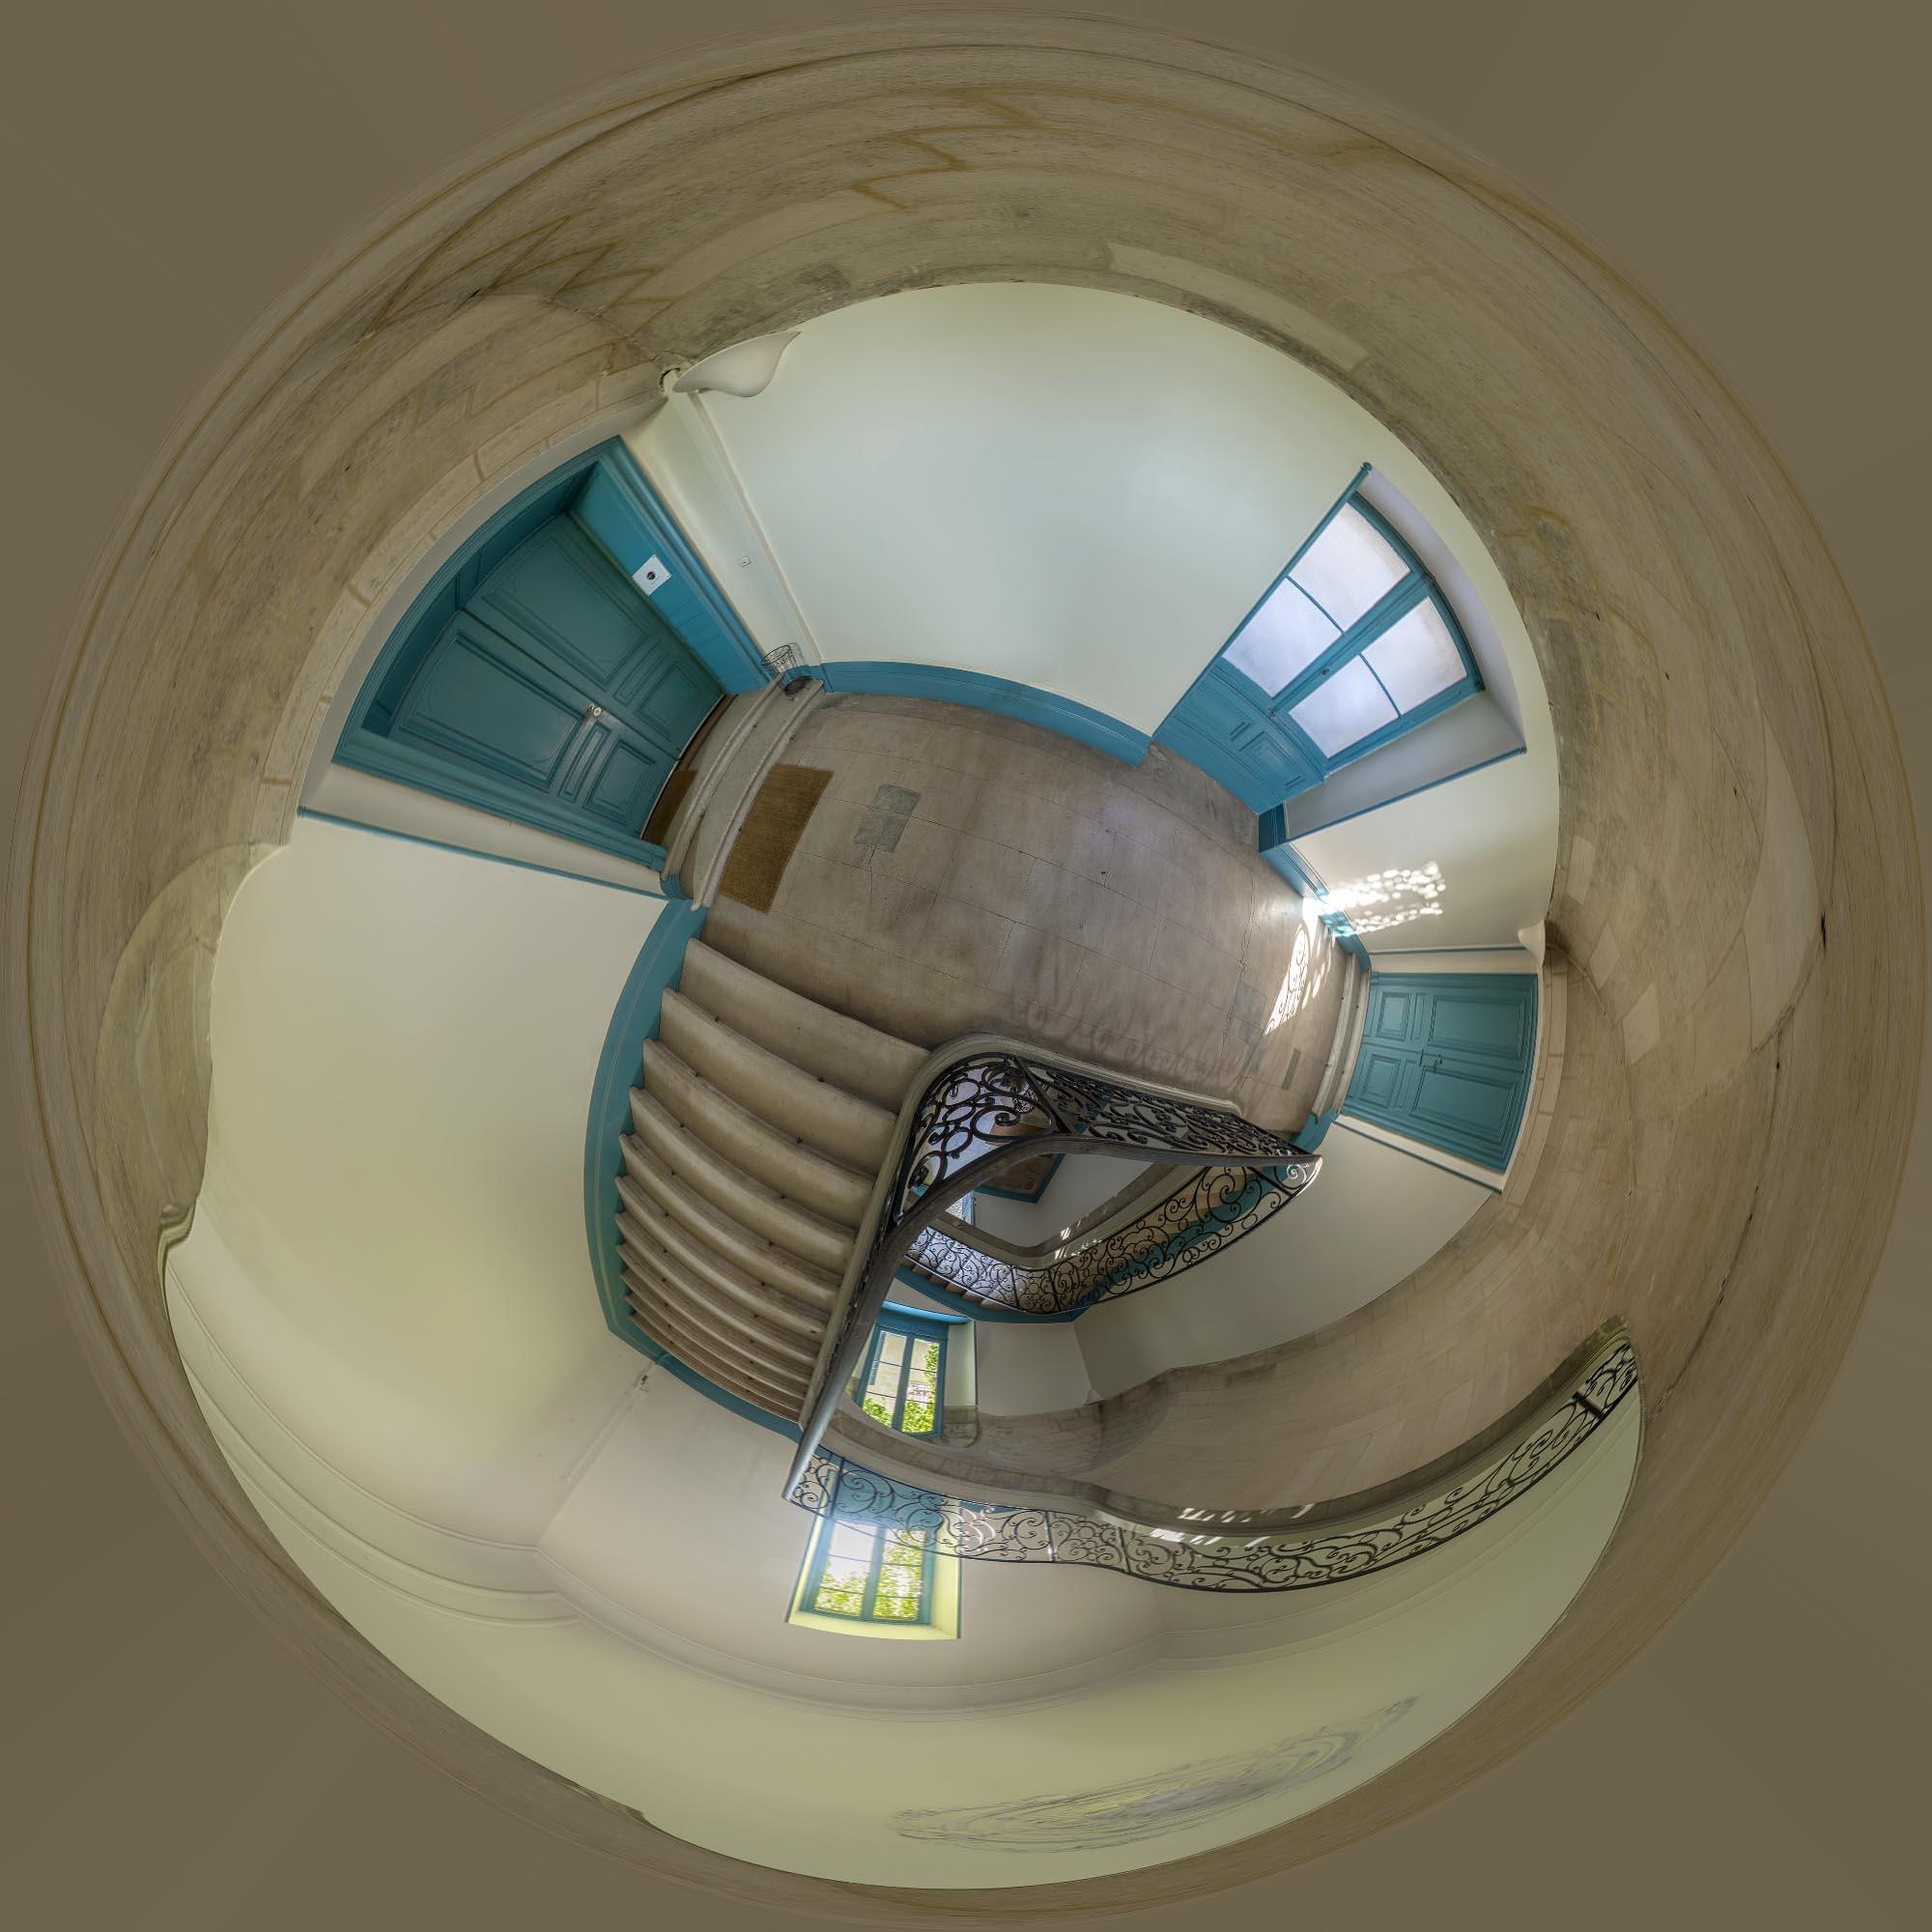 escalier_planet.jpg